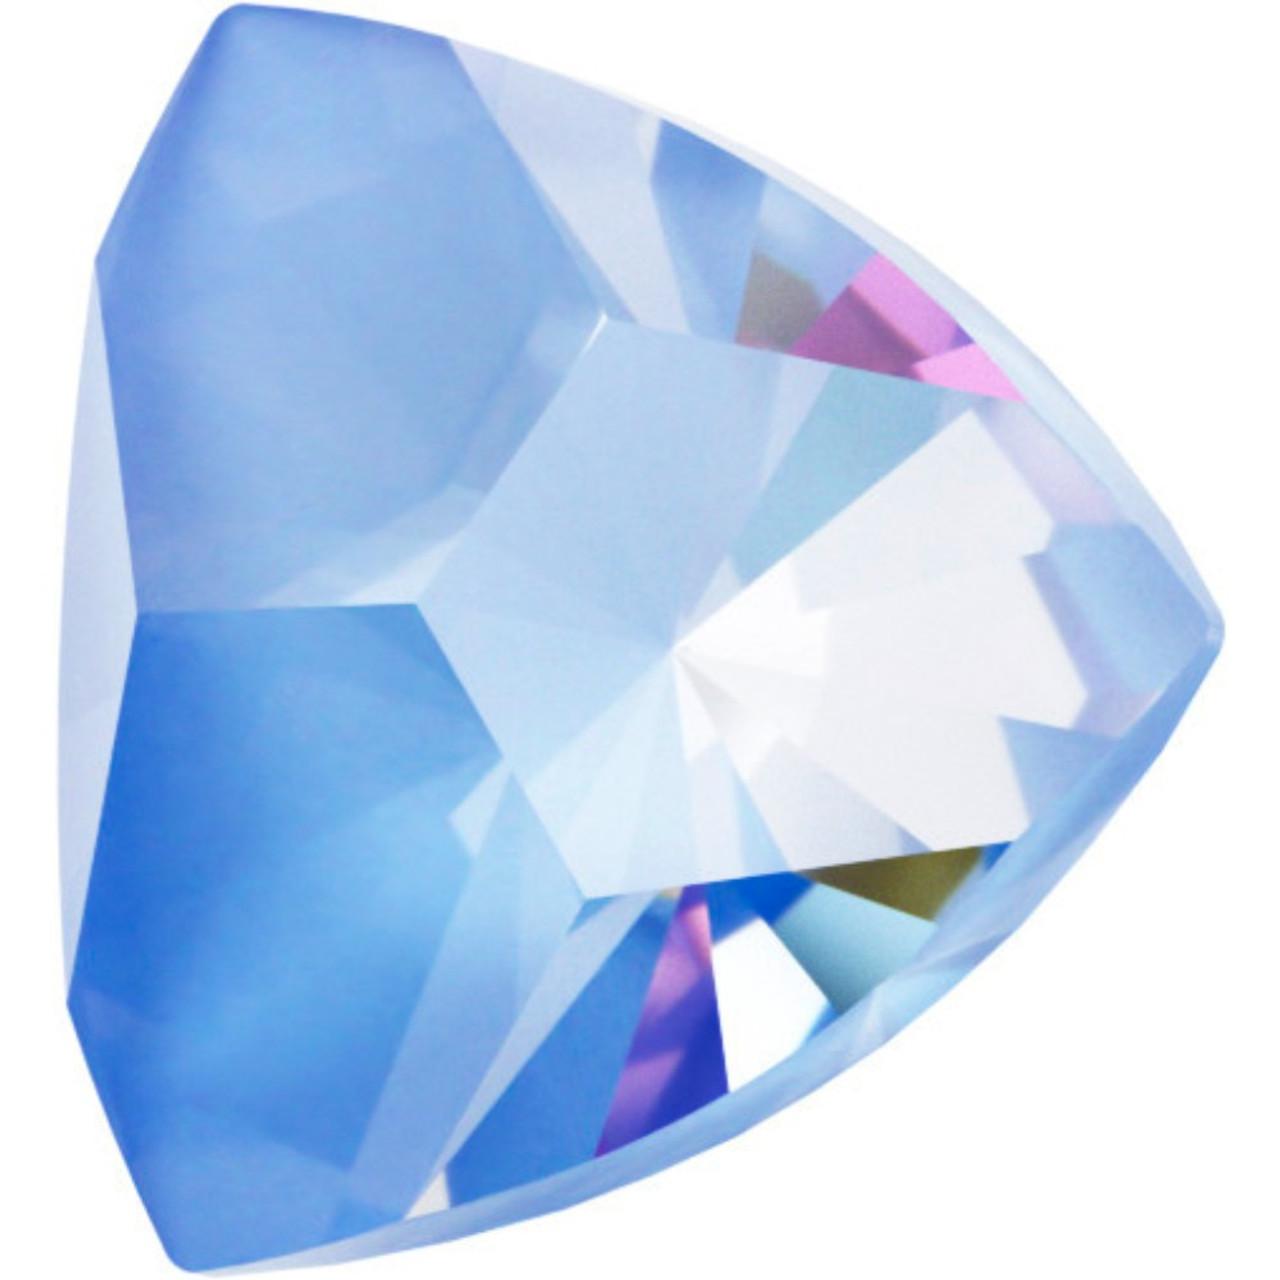 6c96645e001 Swarovski 4799 20mm Kaleidoscope Triangle Fancy Stones Crystal Ocean ...